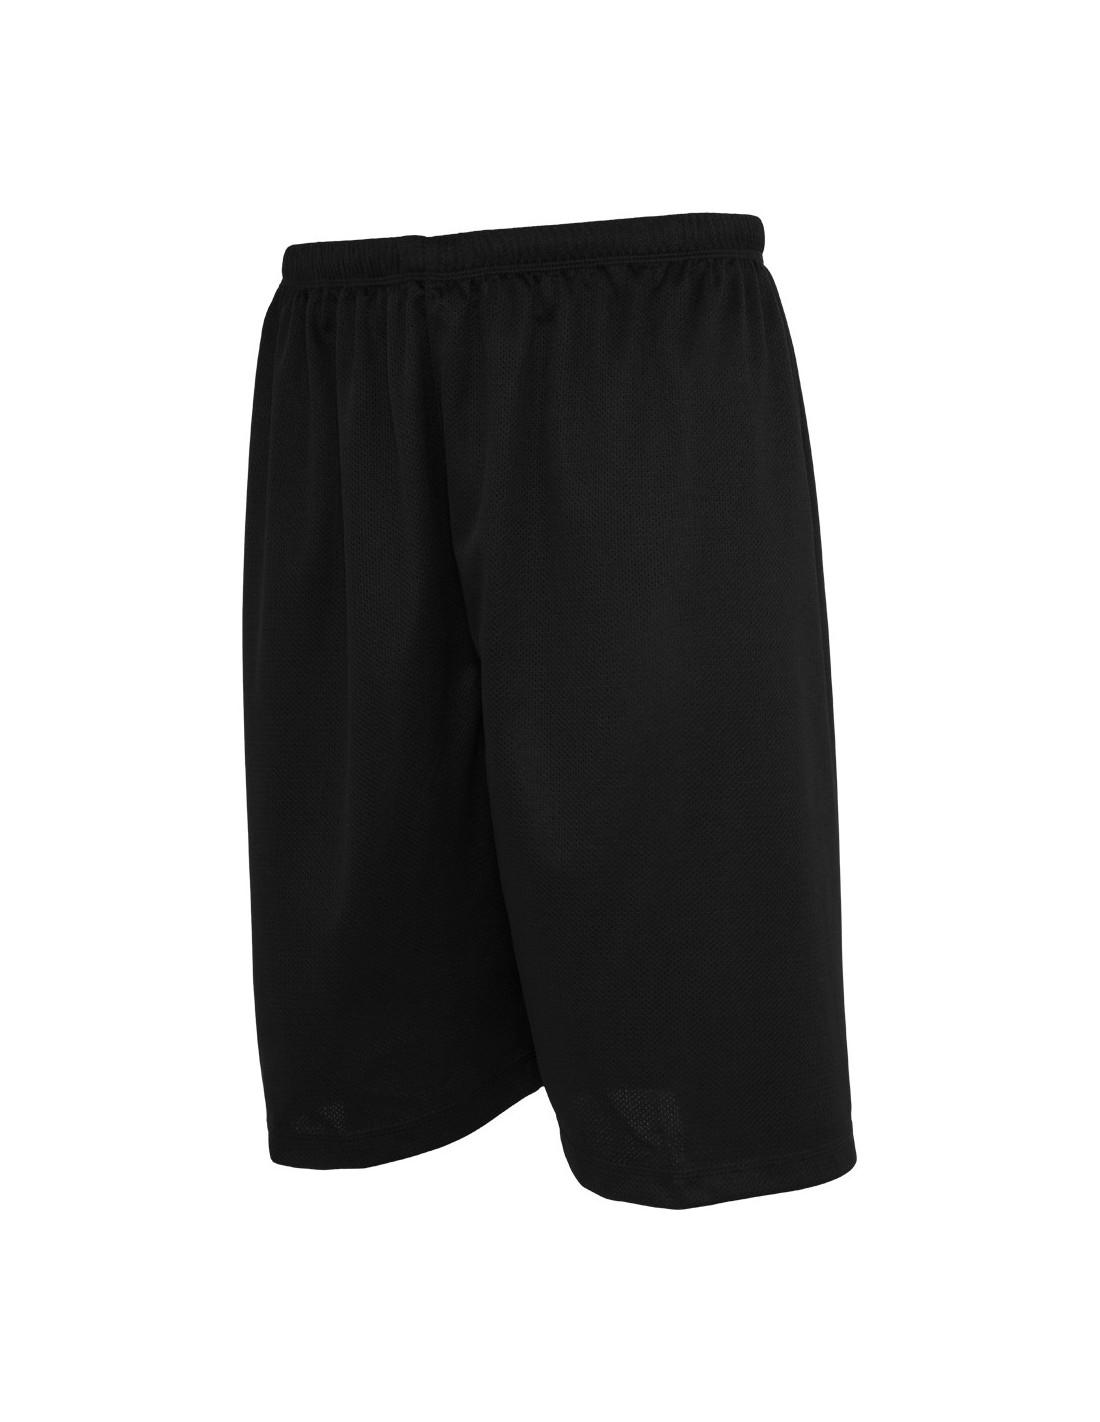 Urban Kids Bball Mesh Shorts black